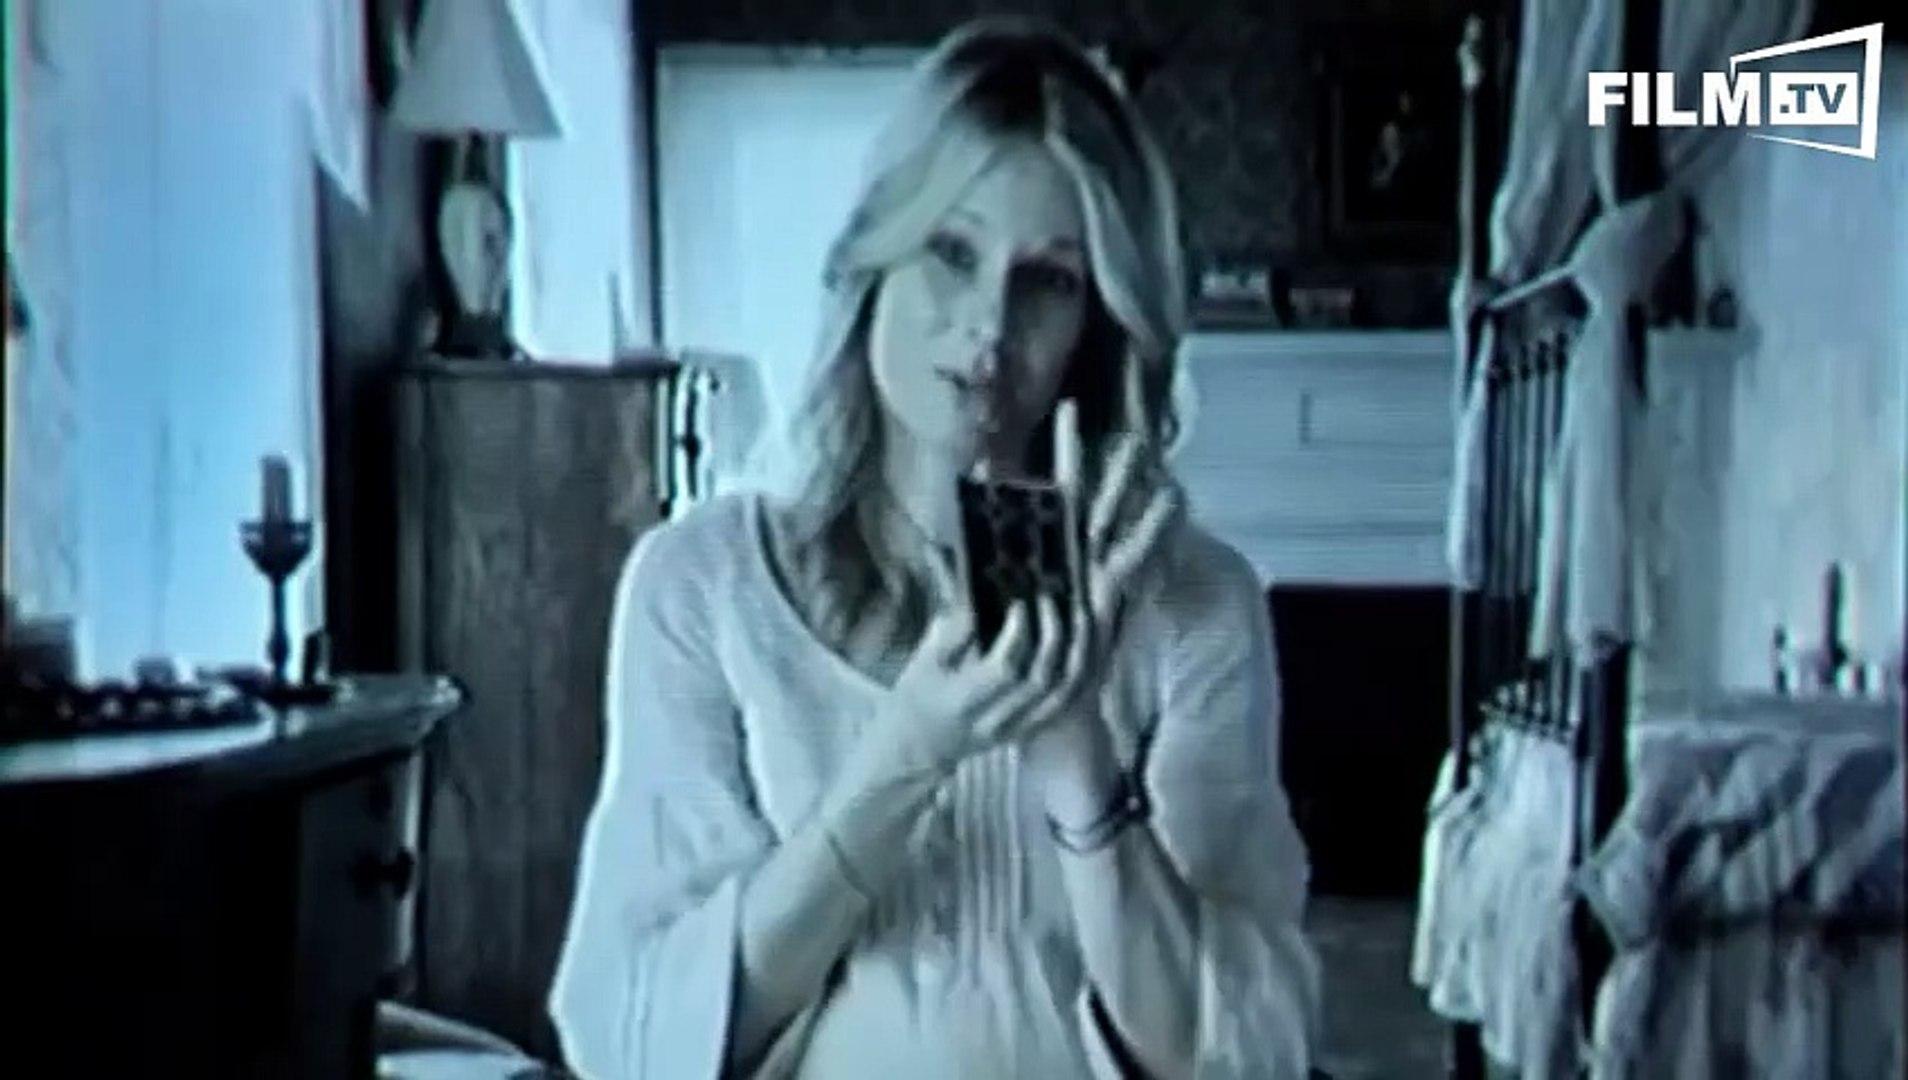 Jessabelle - Trailer - Filmkritik (2016) - Trailer